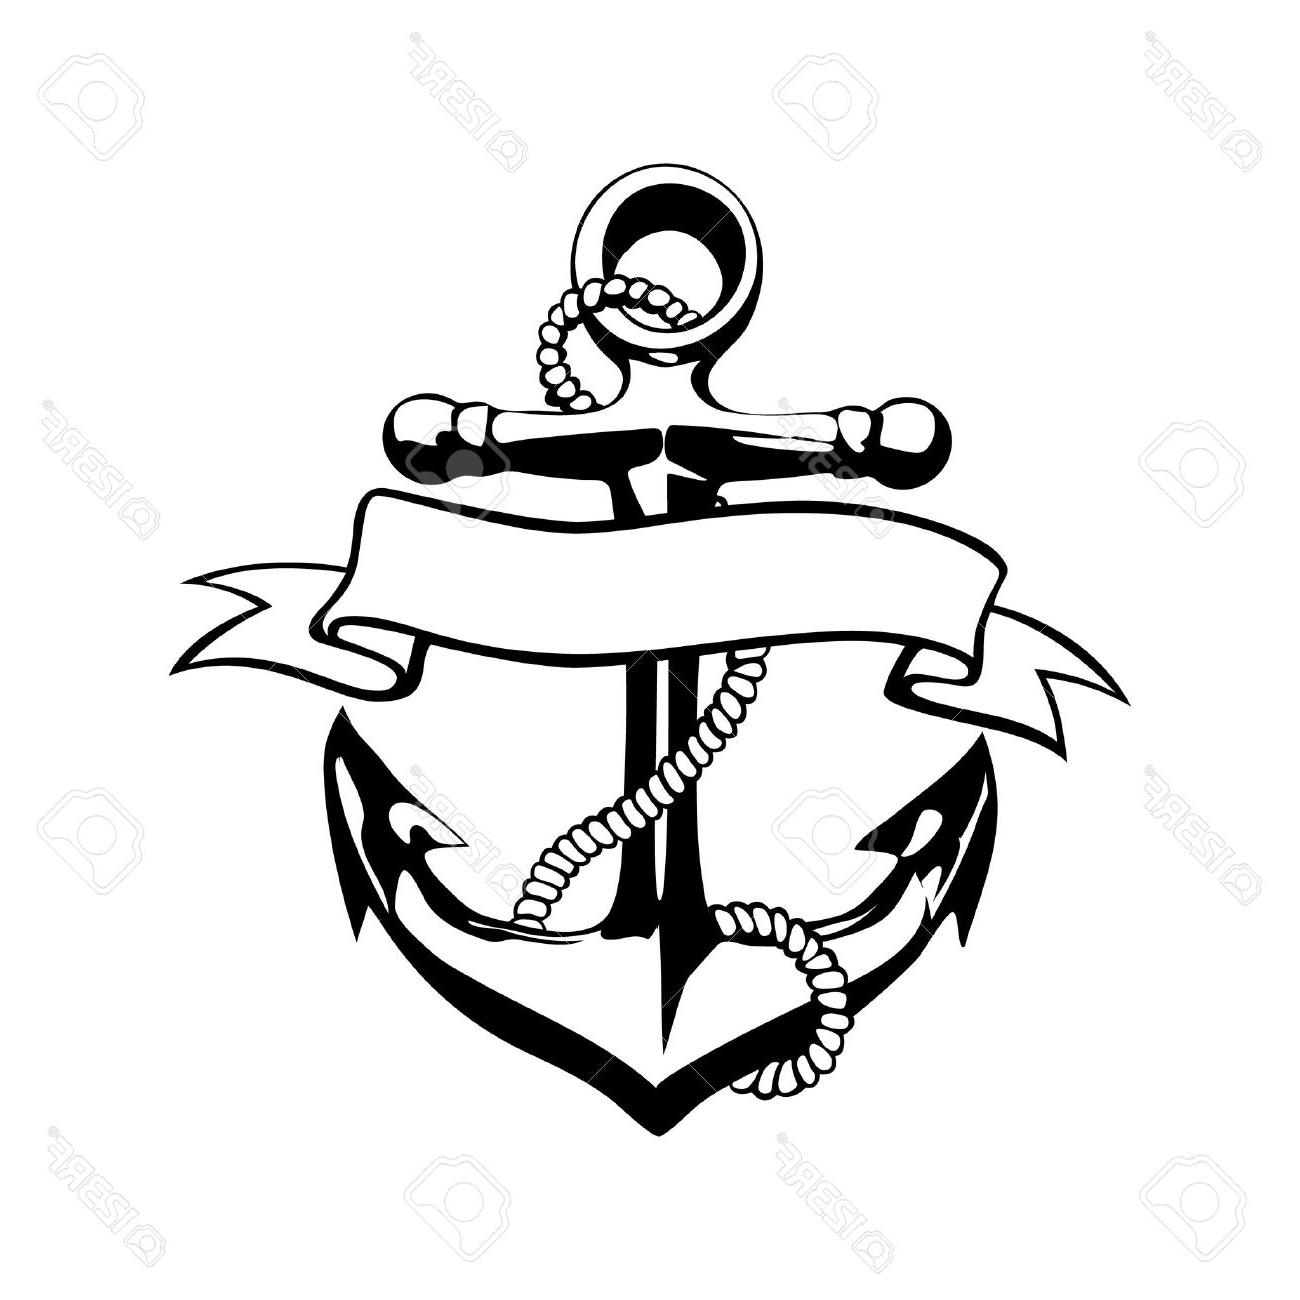 1300x1300 Best Hd Anchor Icon Vector Tattoo Logo Grunge Design Floral Hand